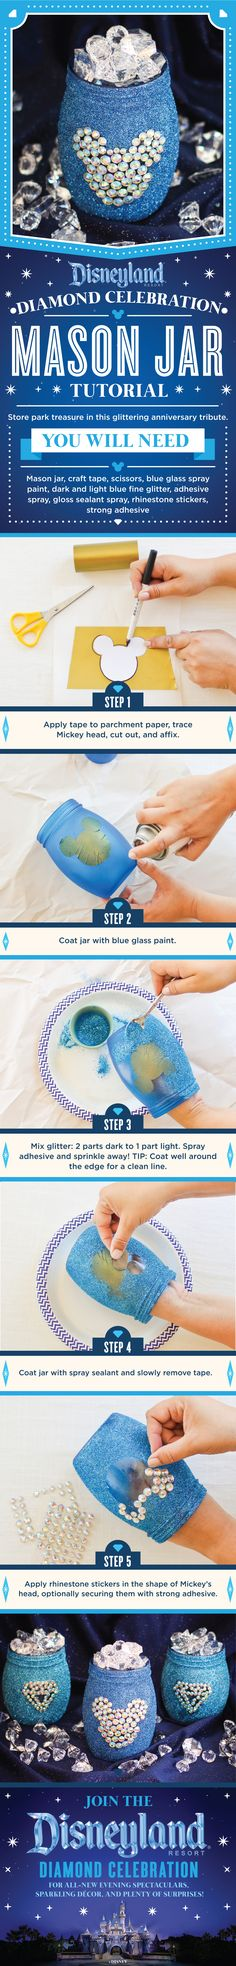 Feeling crafty? Learn how you can make this dazzling DIY Mason jar, inspired by the Disneyland Resort Diamond Celebration!